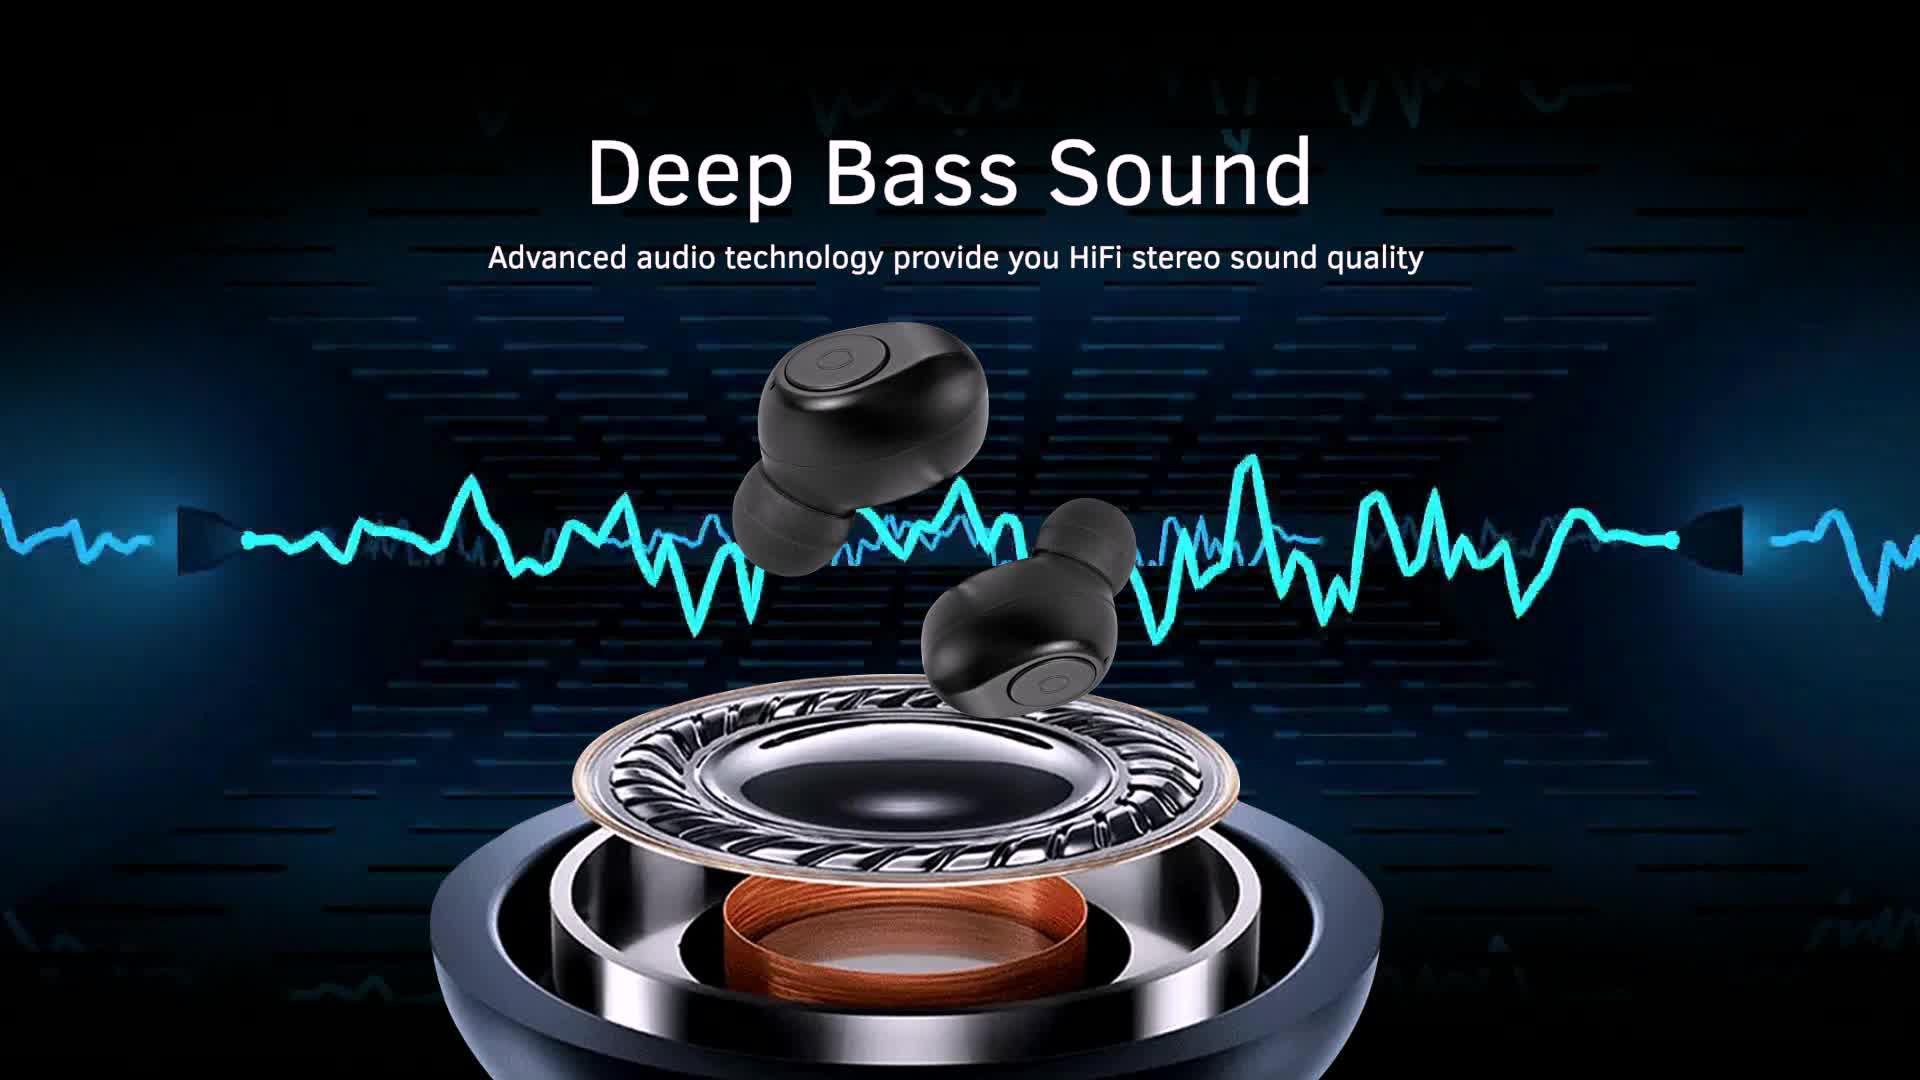 Super-Fast Paring True Wireless Stereo TWS In-Ear Bluetooth V5.0 Ear Buds Earphones RX19 with 96H 2000mAh Powerbank Box